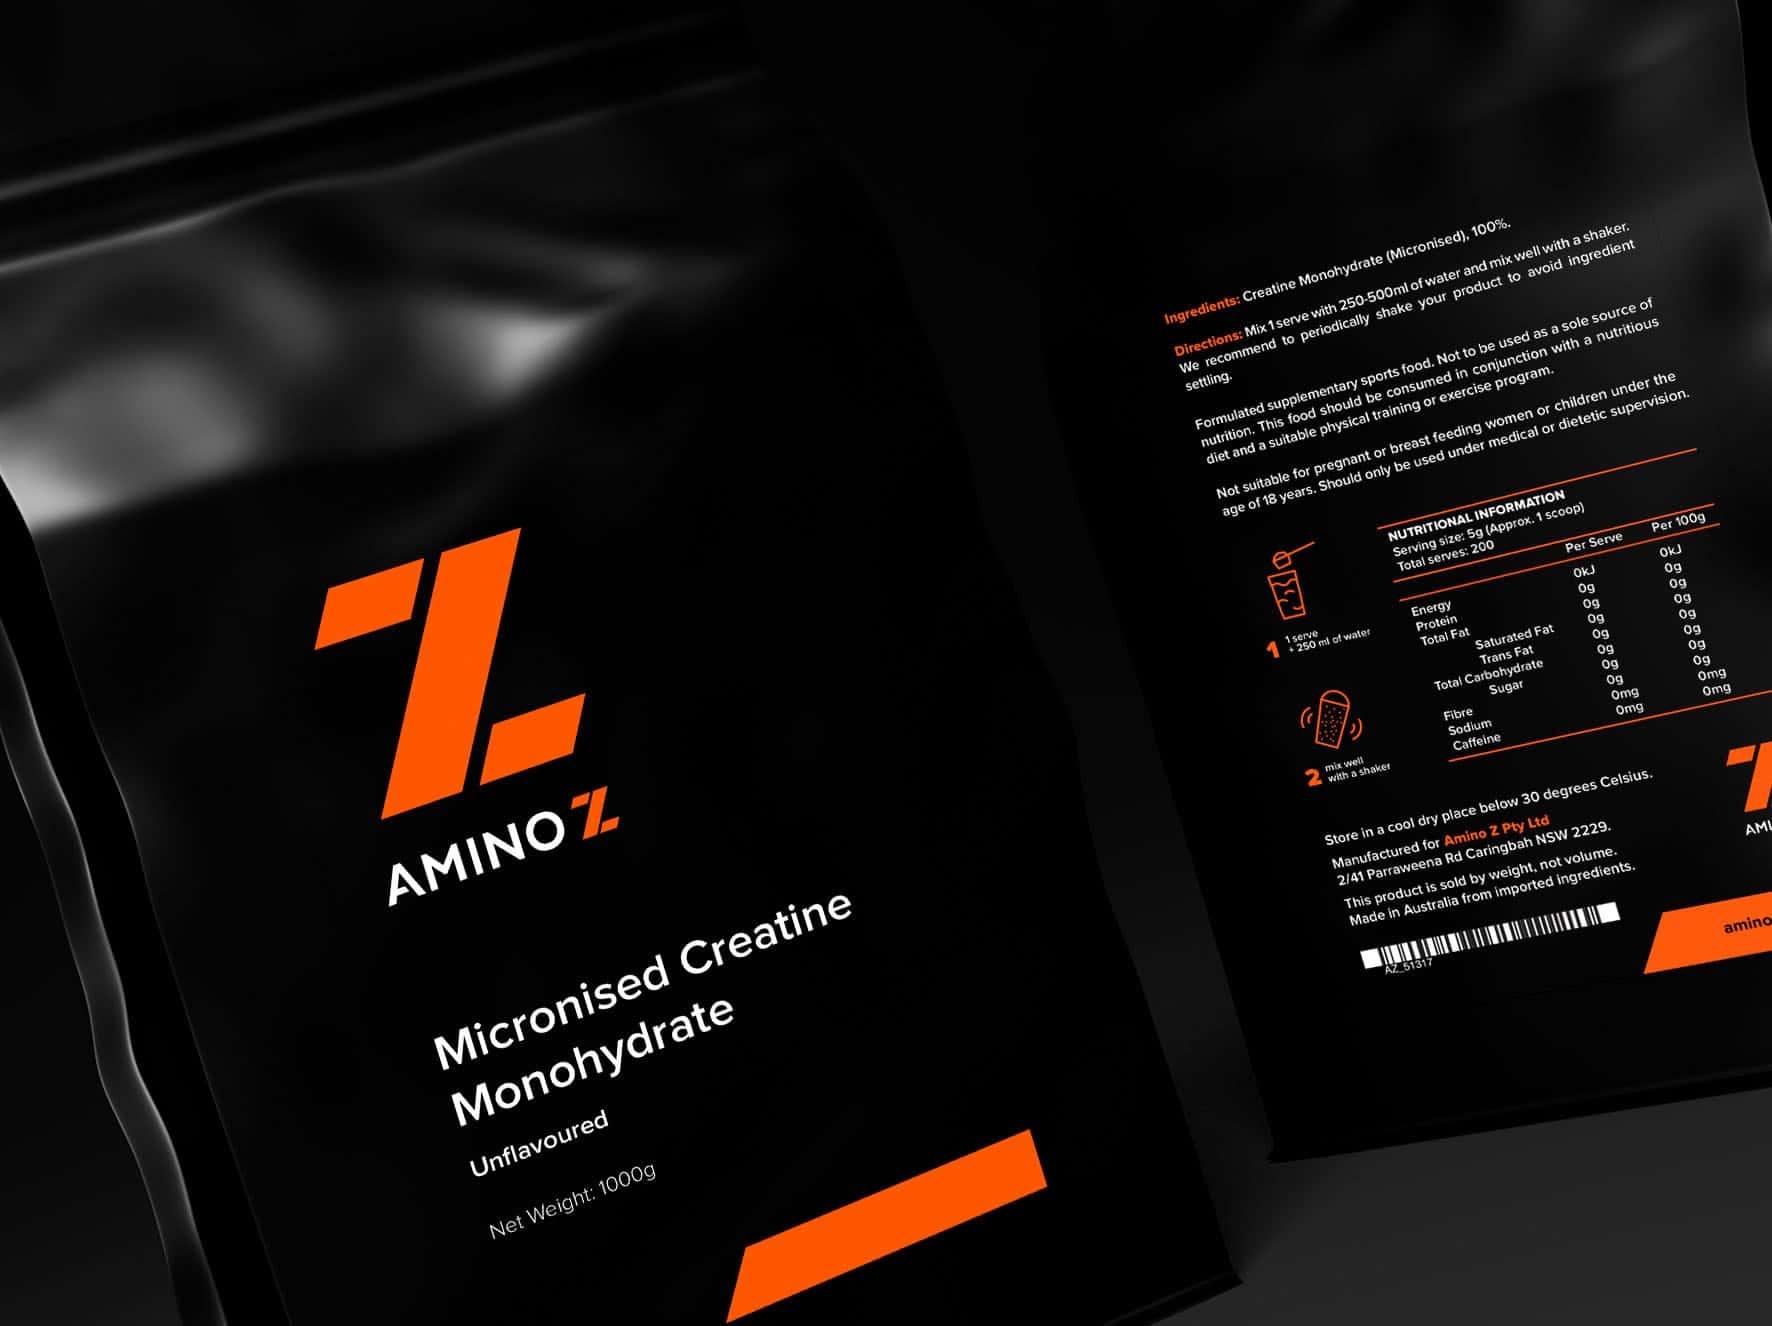 AminoZ-projektowanie-etykiet-opakowan-lodz-packaging-design-pictoo